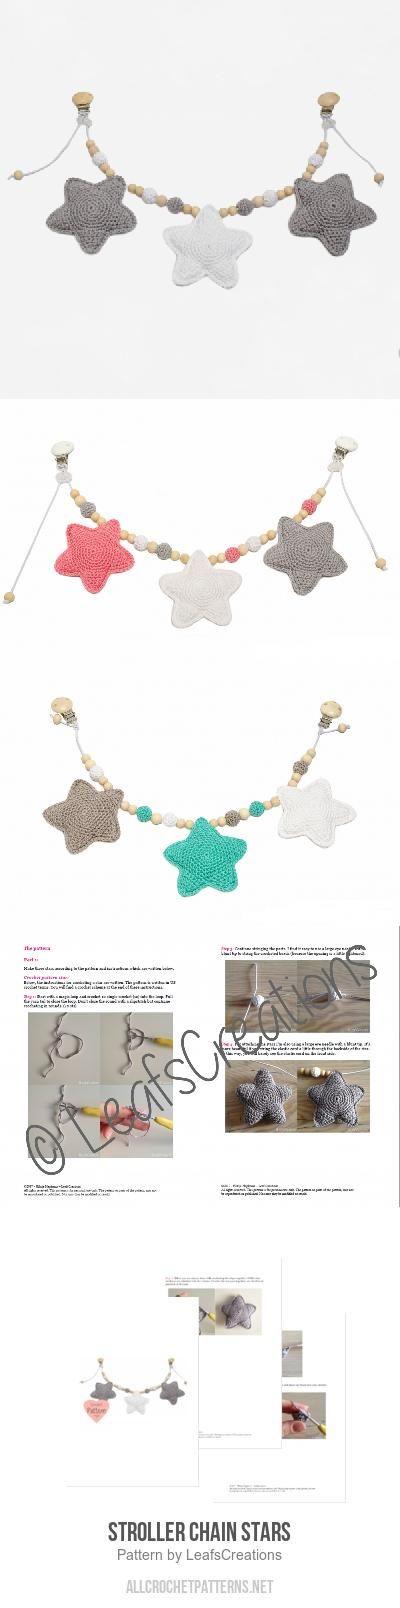 Stroller chain stars crochet pattern